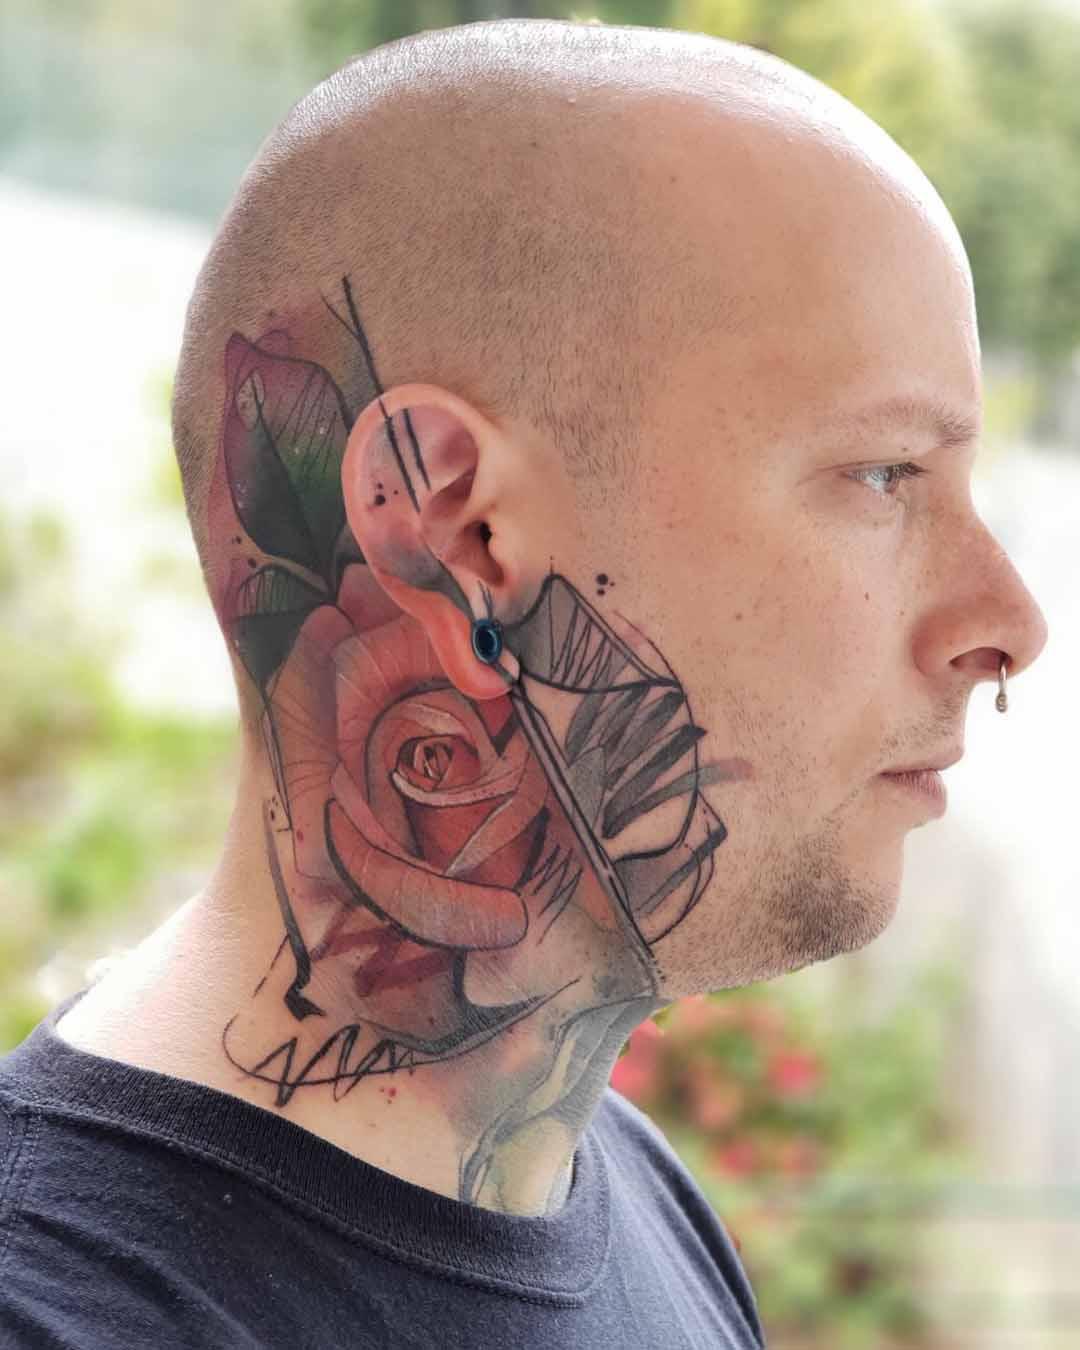 neck side tattoo rose